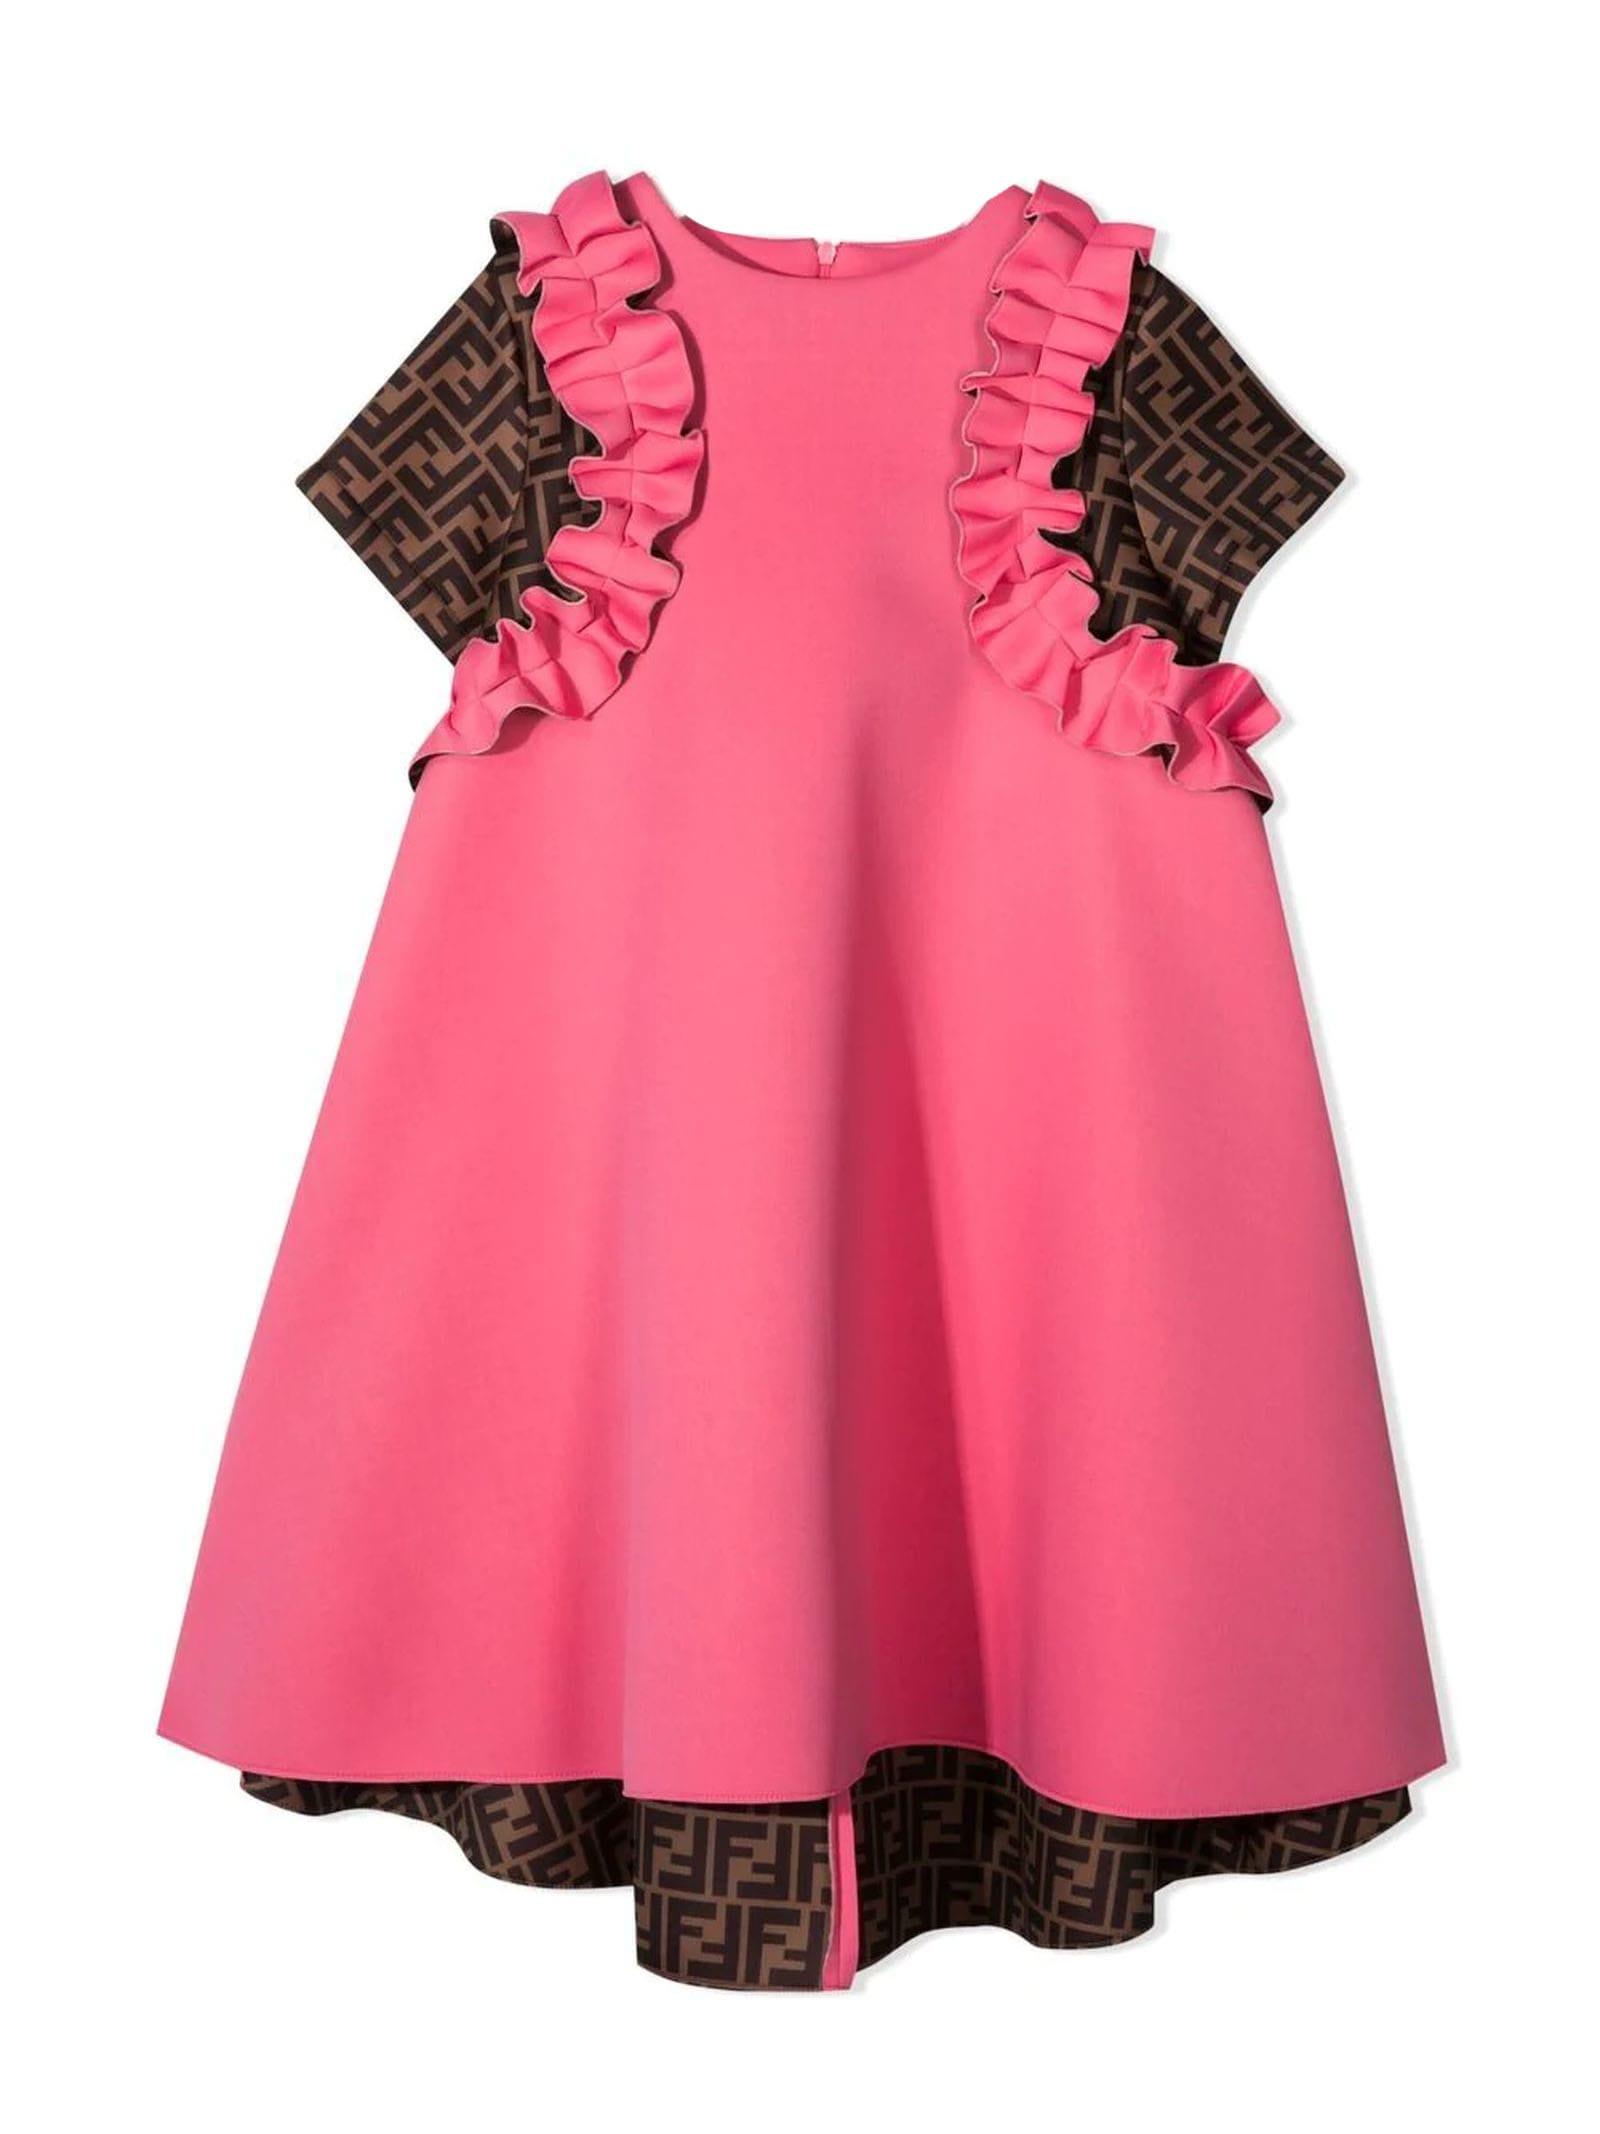 Fendi PINK AND BROWN DRESS